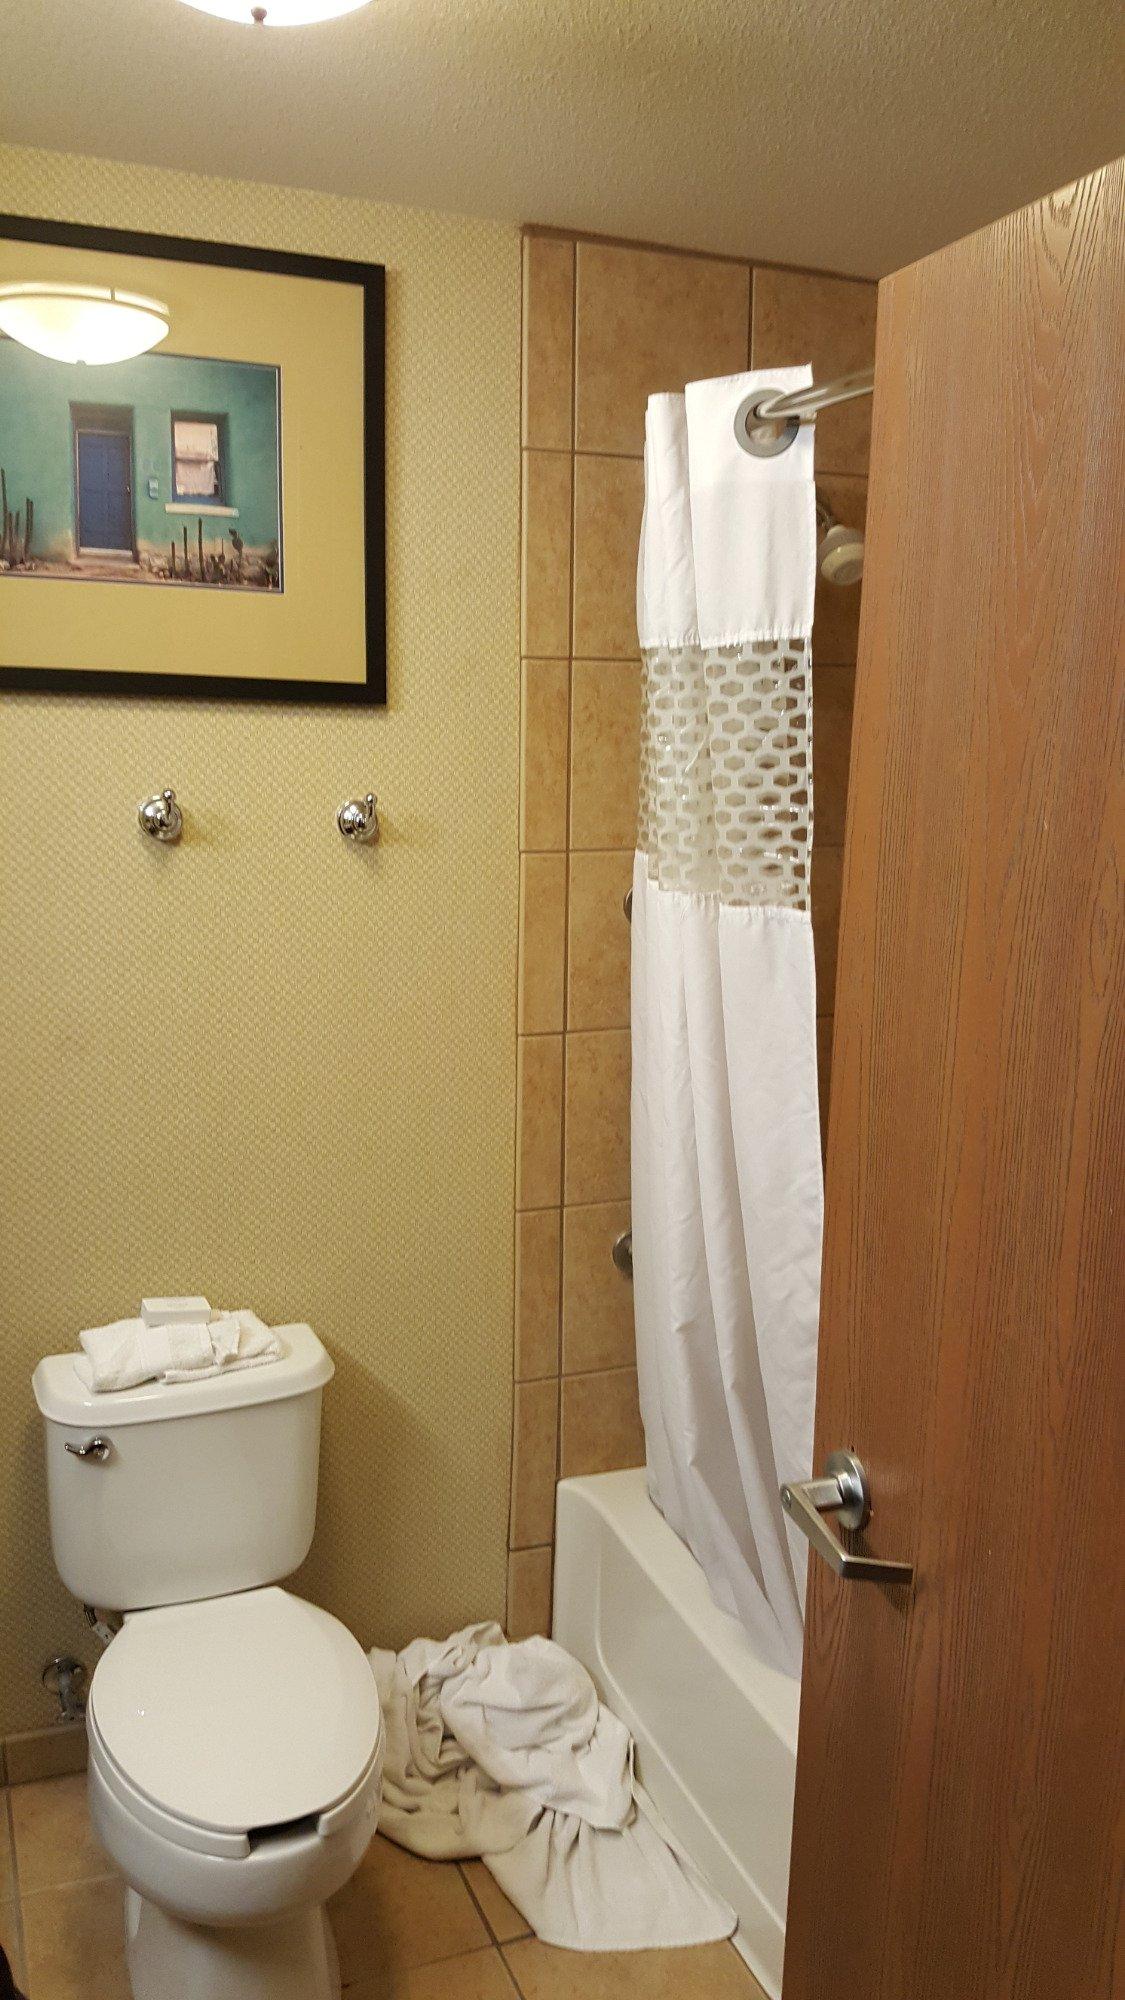 Bathroom Remodel Yuma Az hampton inn & suites yuma - updated 2017 prices & hotel reviews